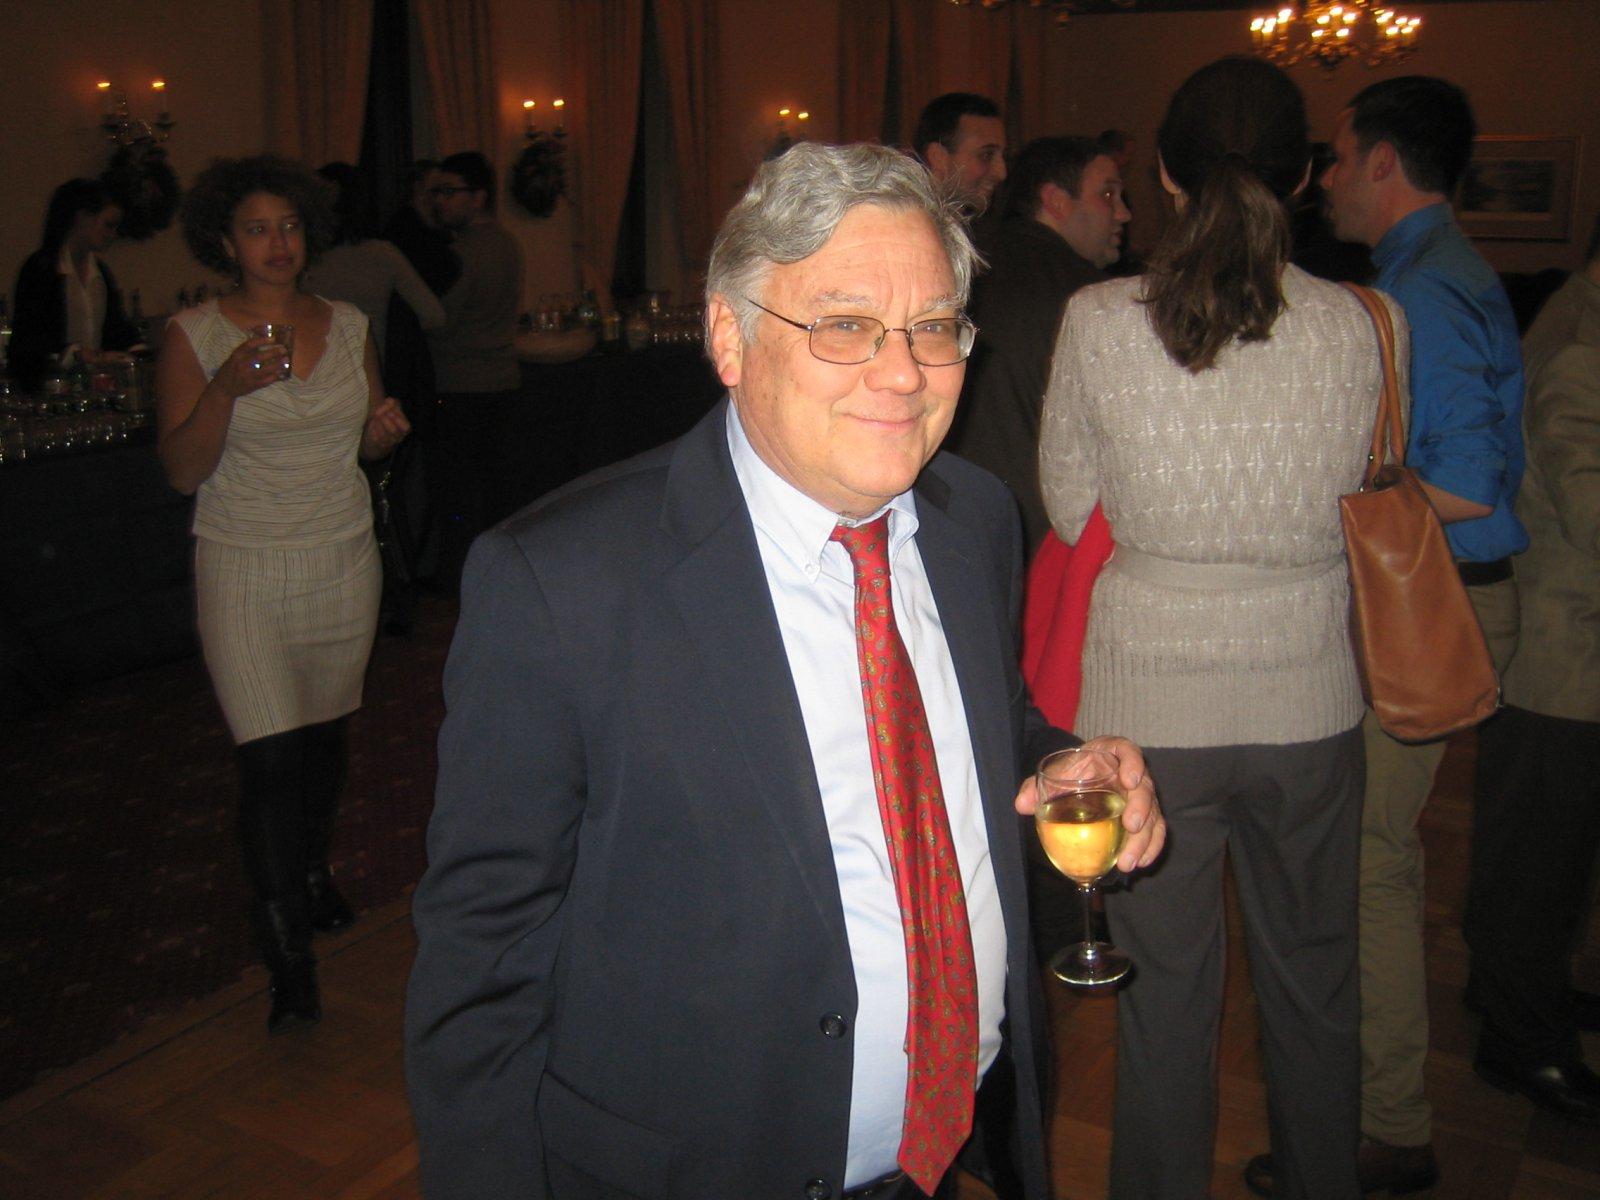 Atty. Randy Nass, husband of judicial candidate Janet Protasiewicz.